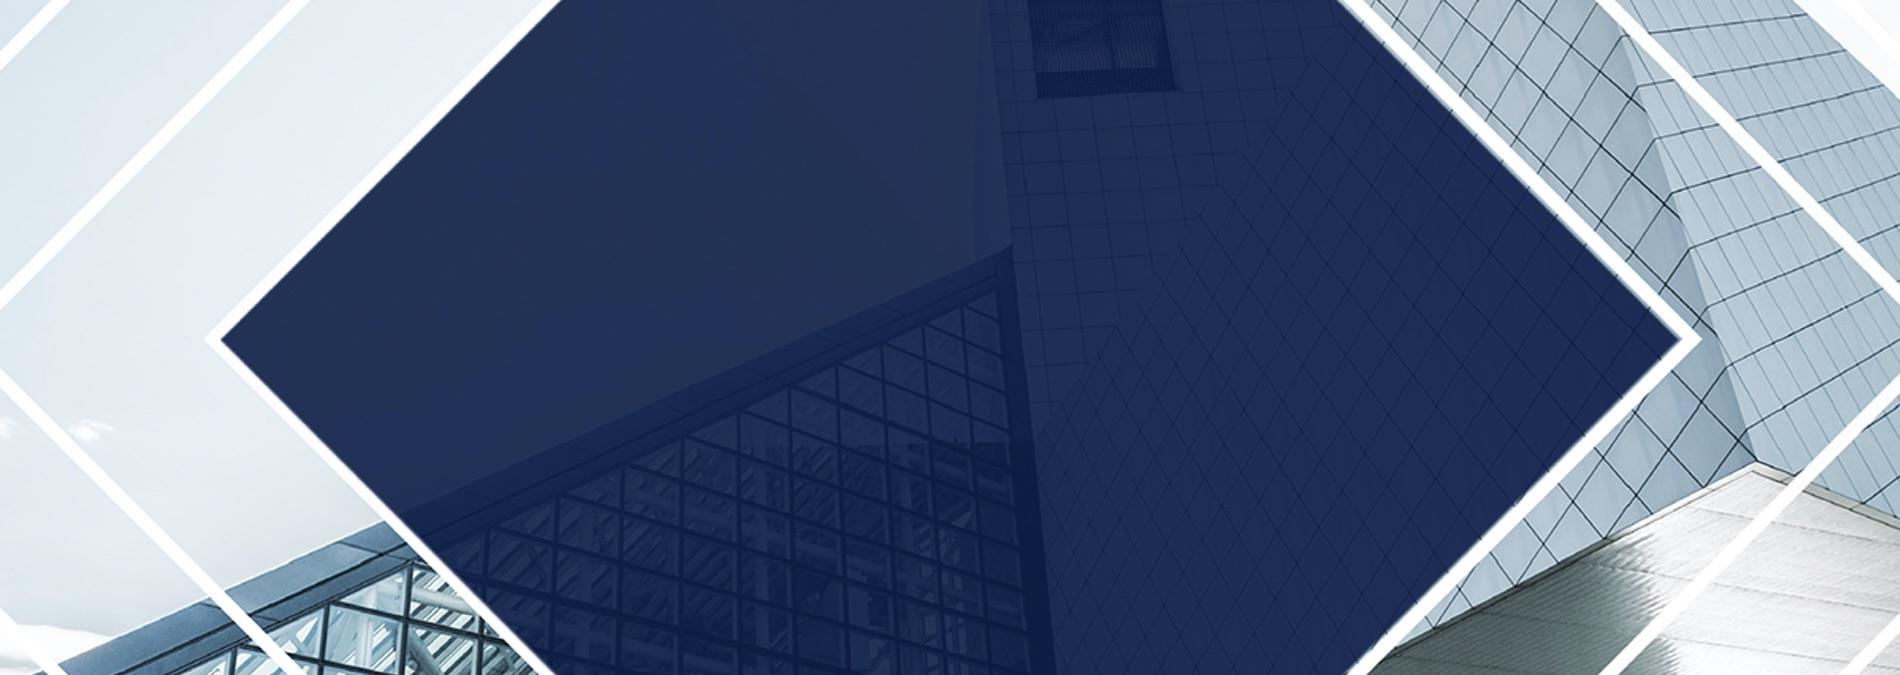 OTIS-innovation page module